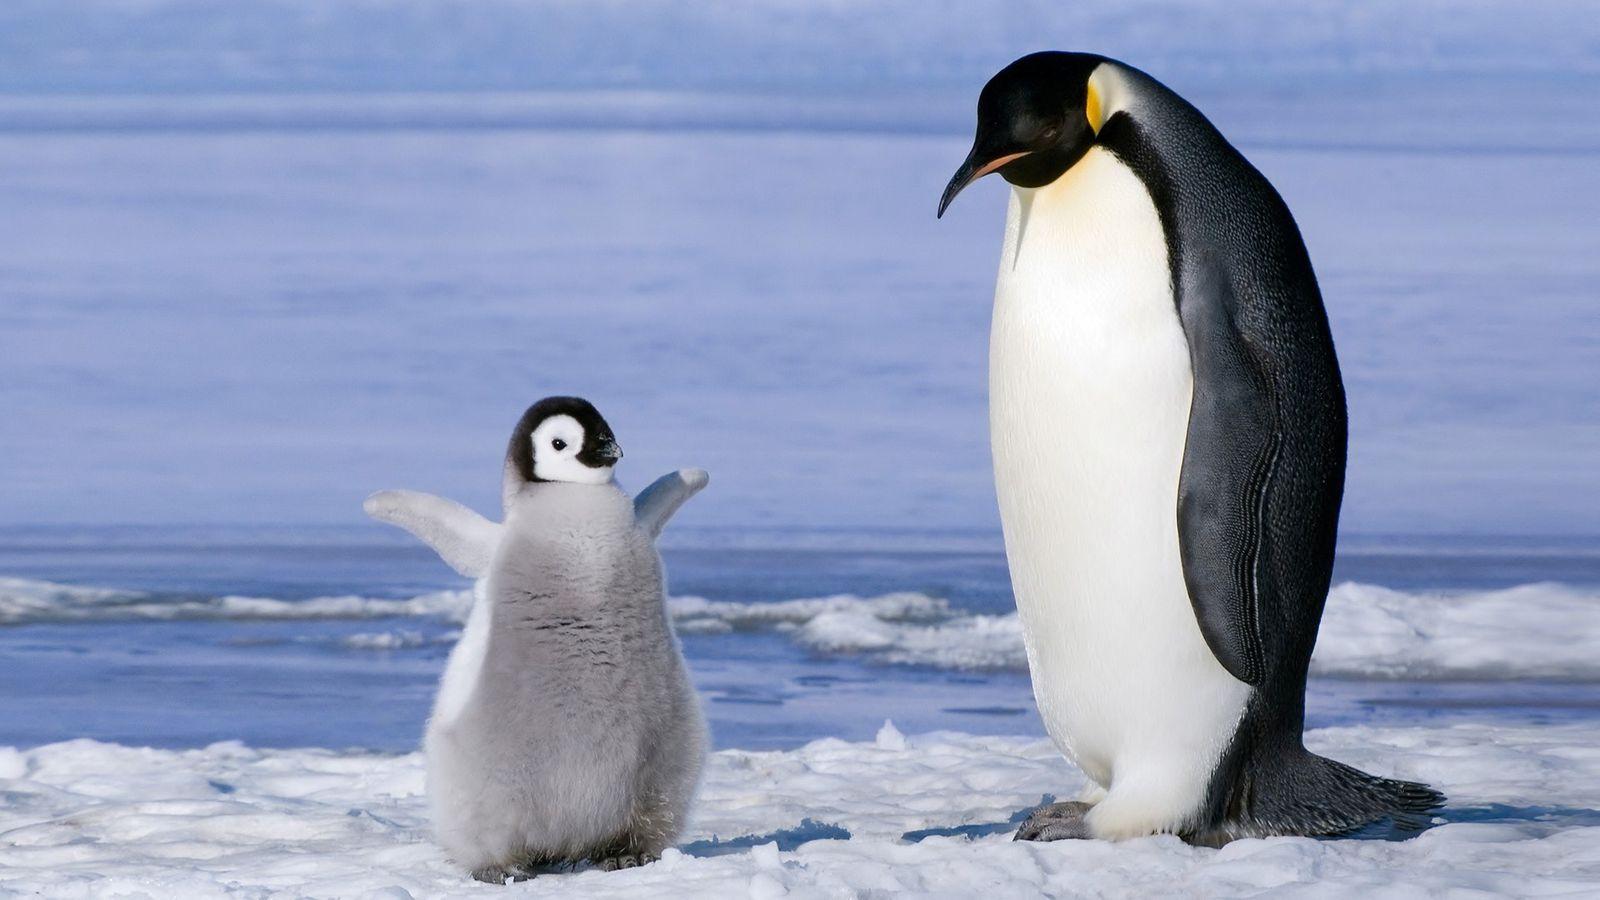 Emperor Penguin and Chick Wallpaper   Wallpaper Stream 1600x900